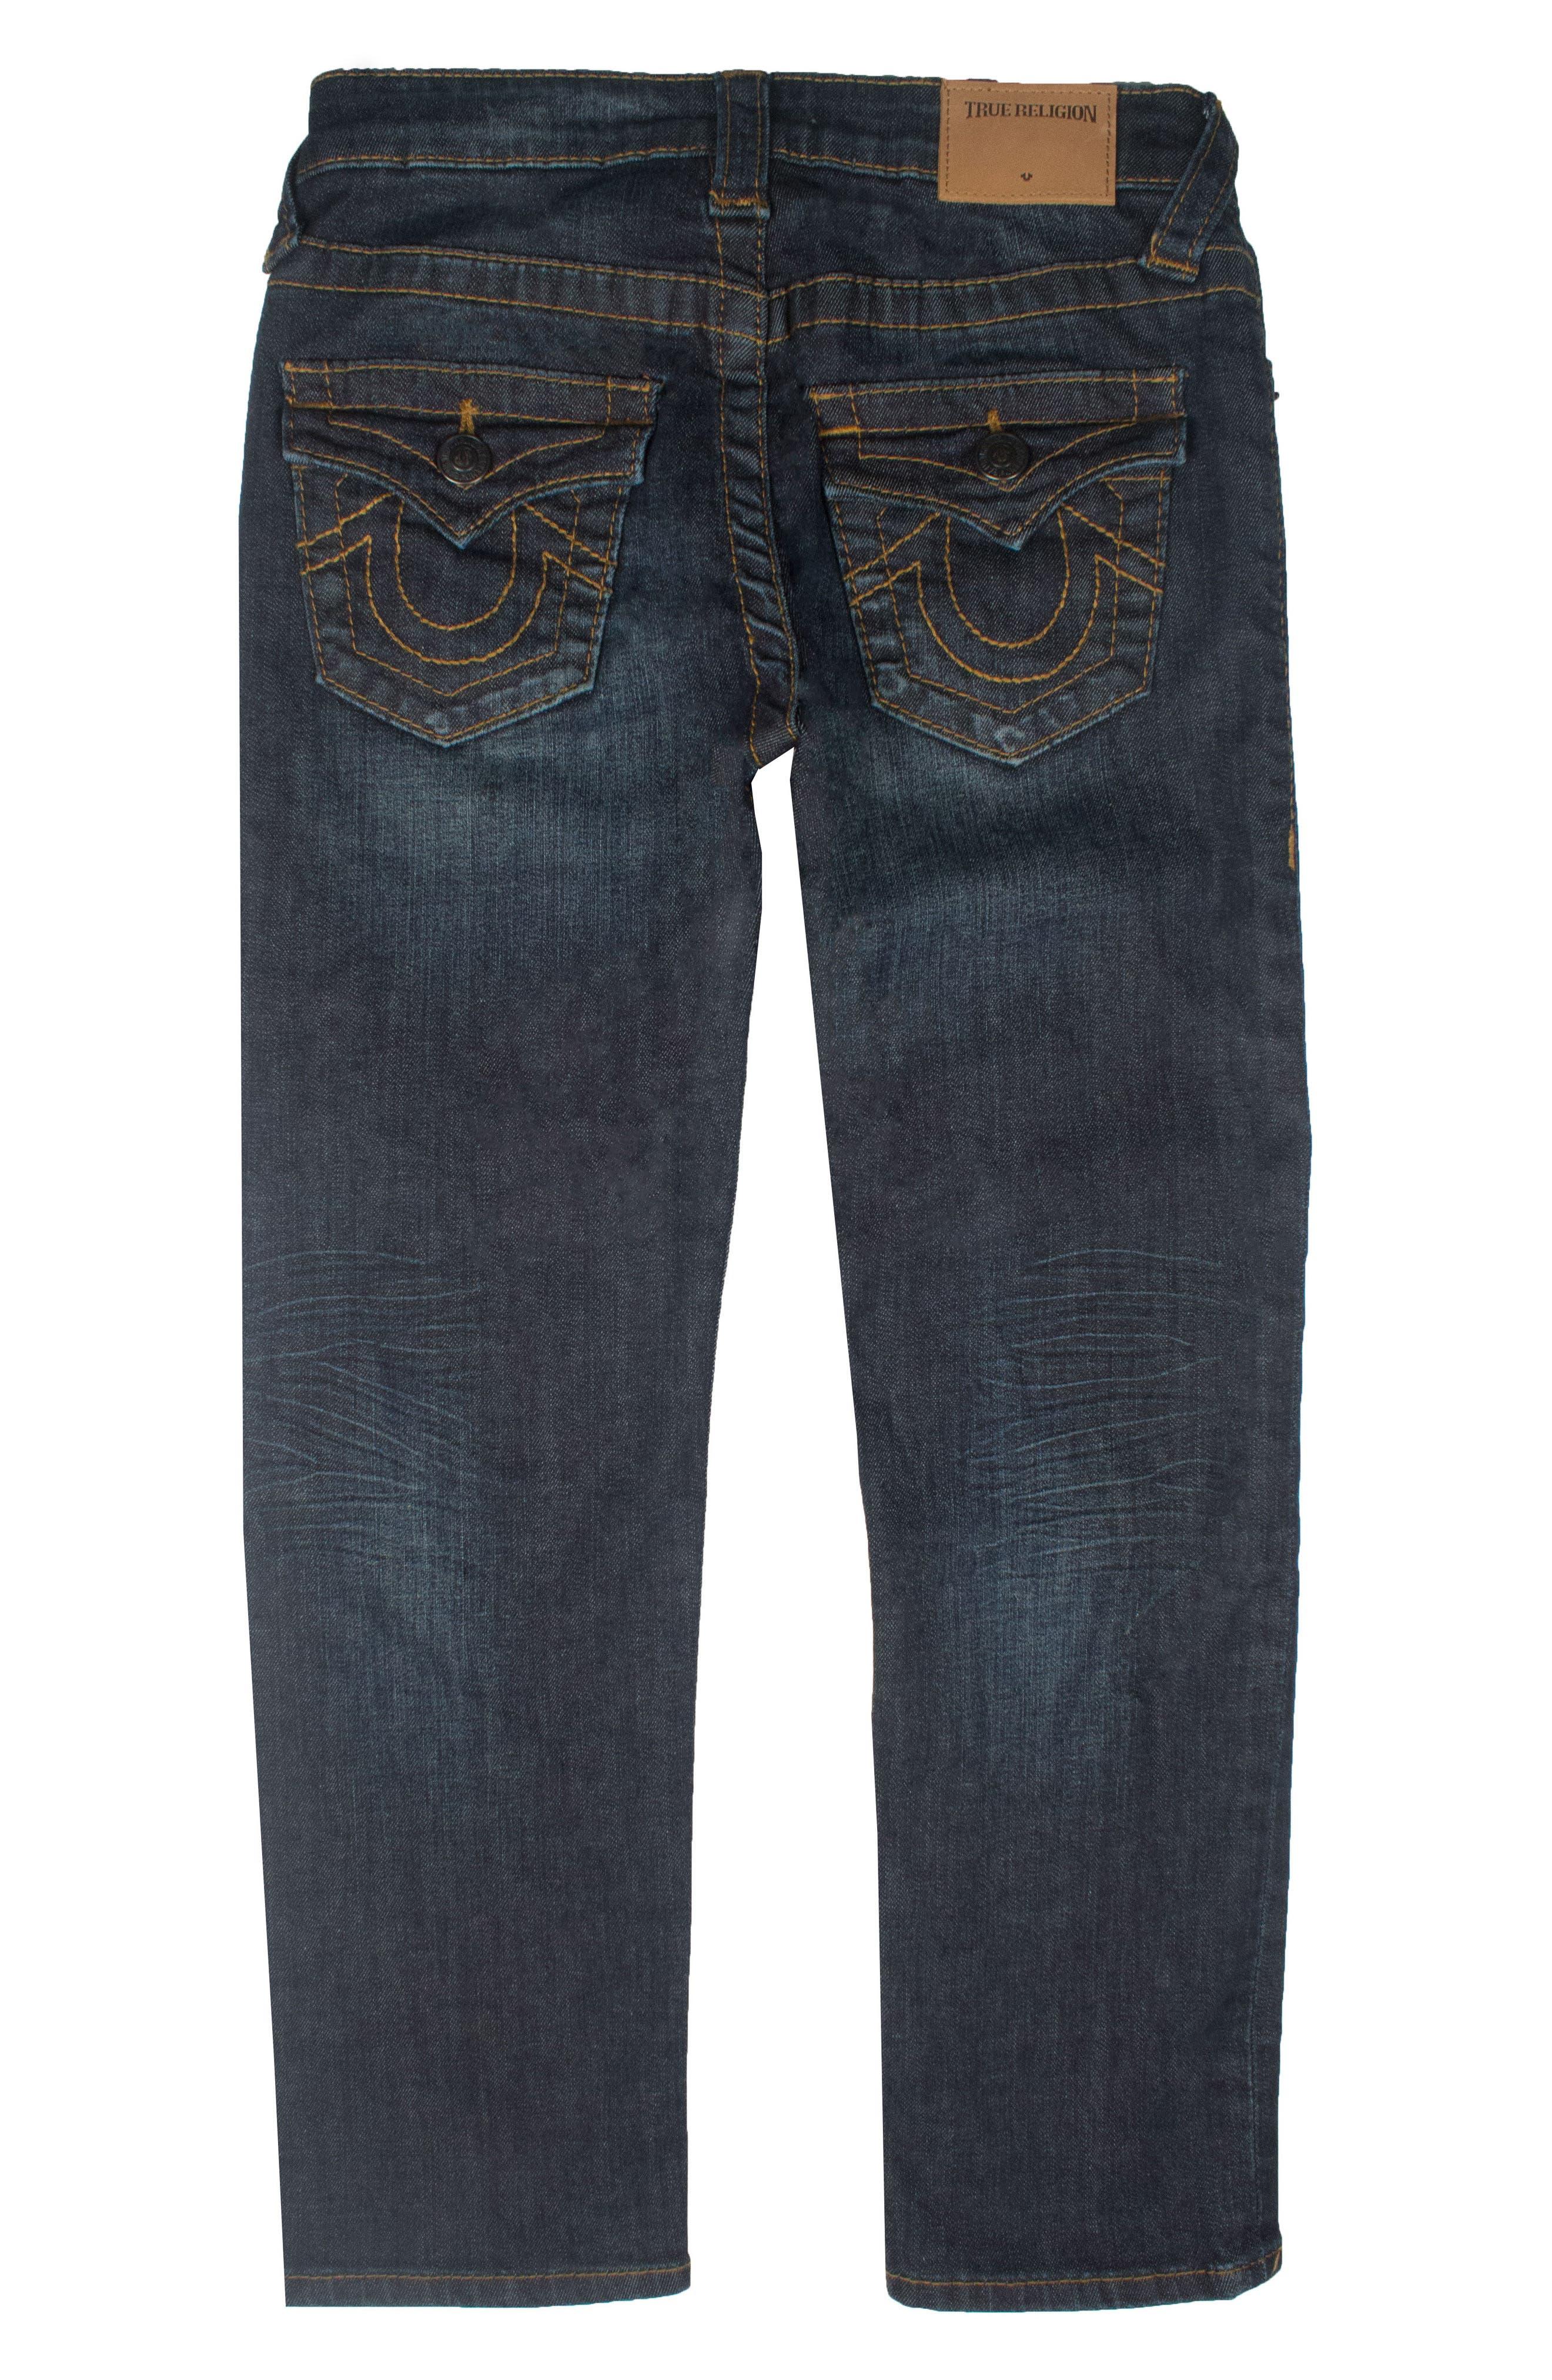 Geno Single End Straight Leg Jeans,                             Main thumbnail 1, color,                             473